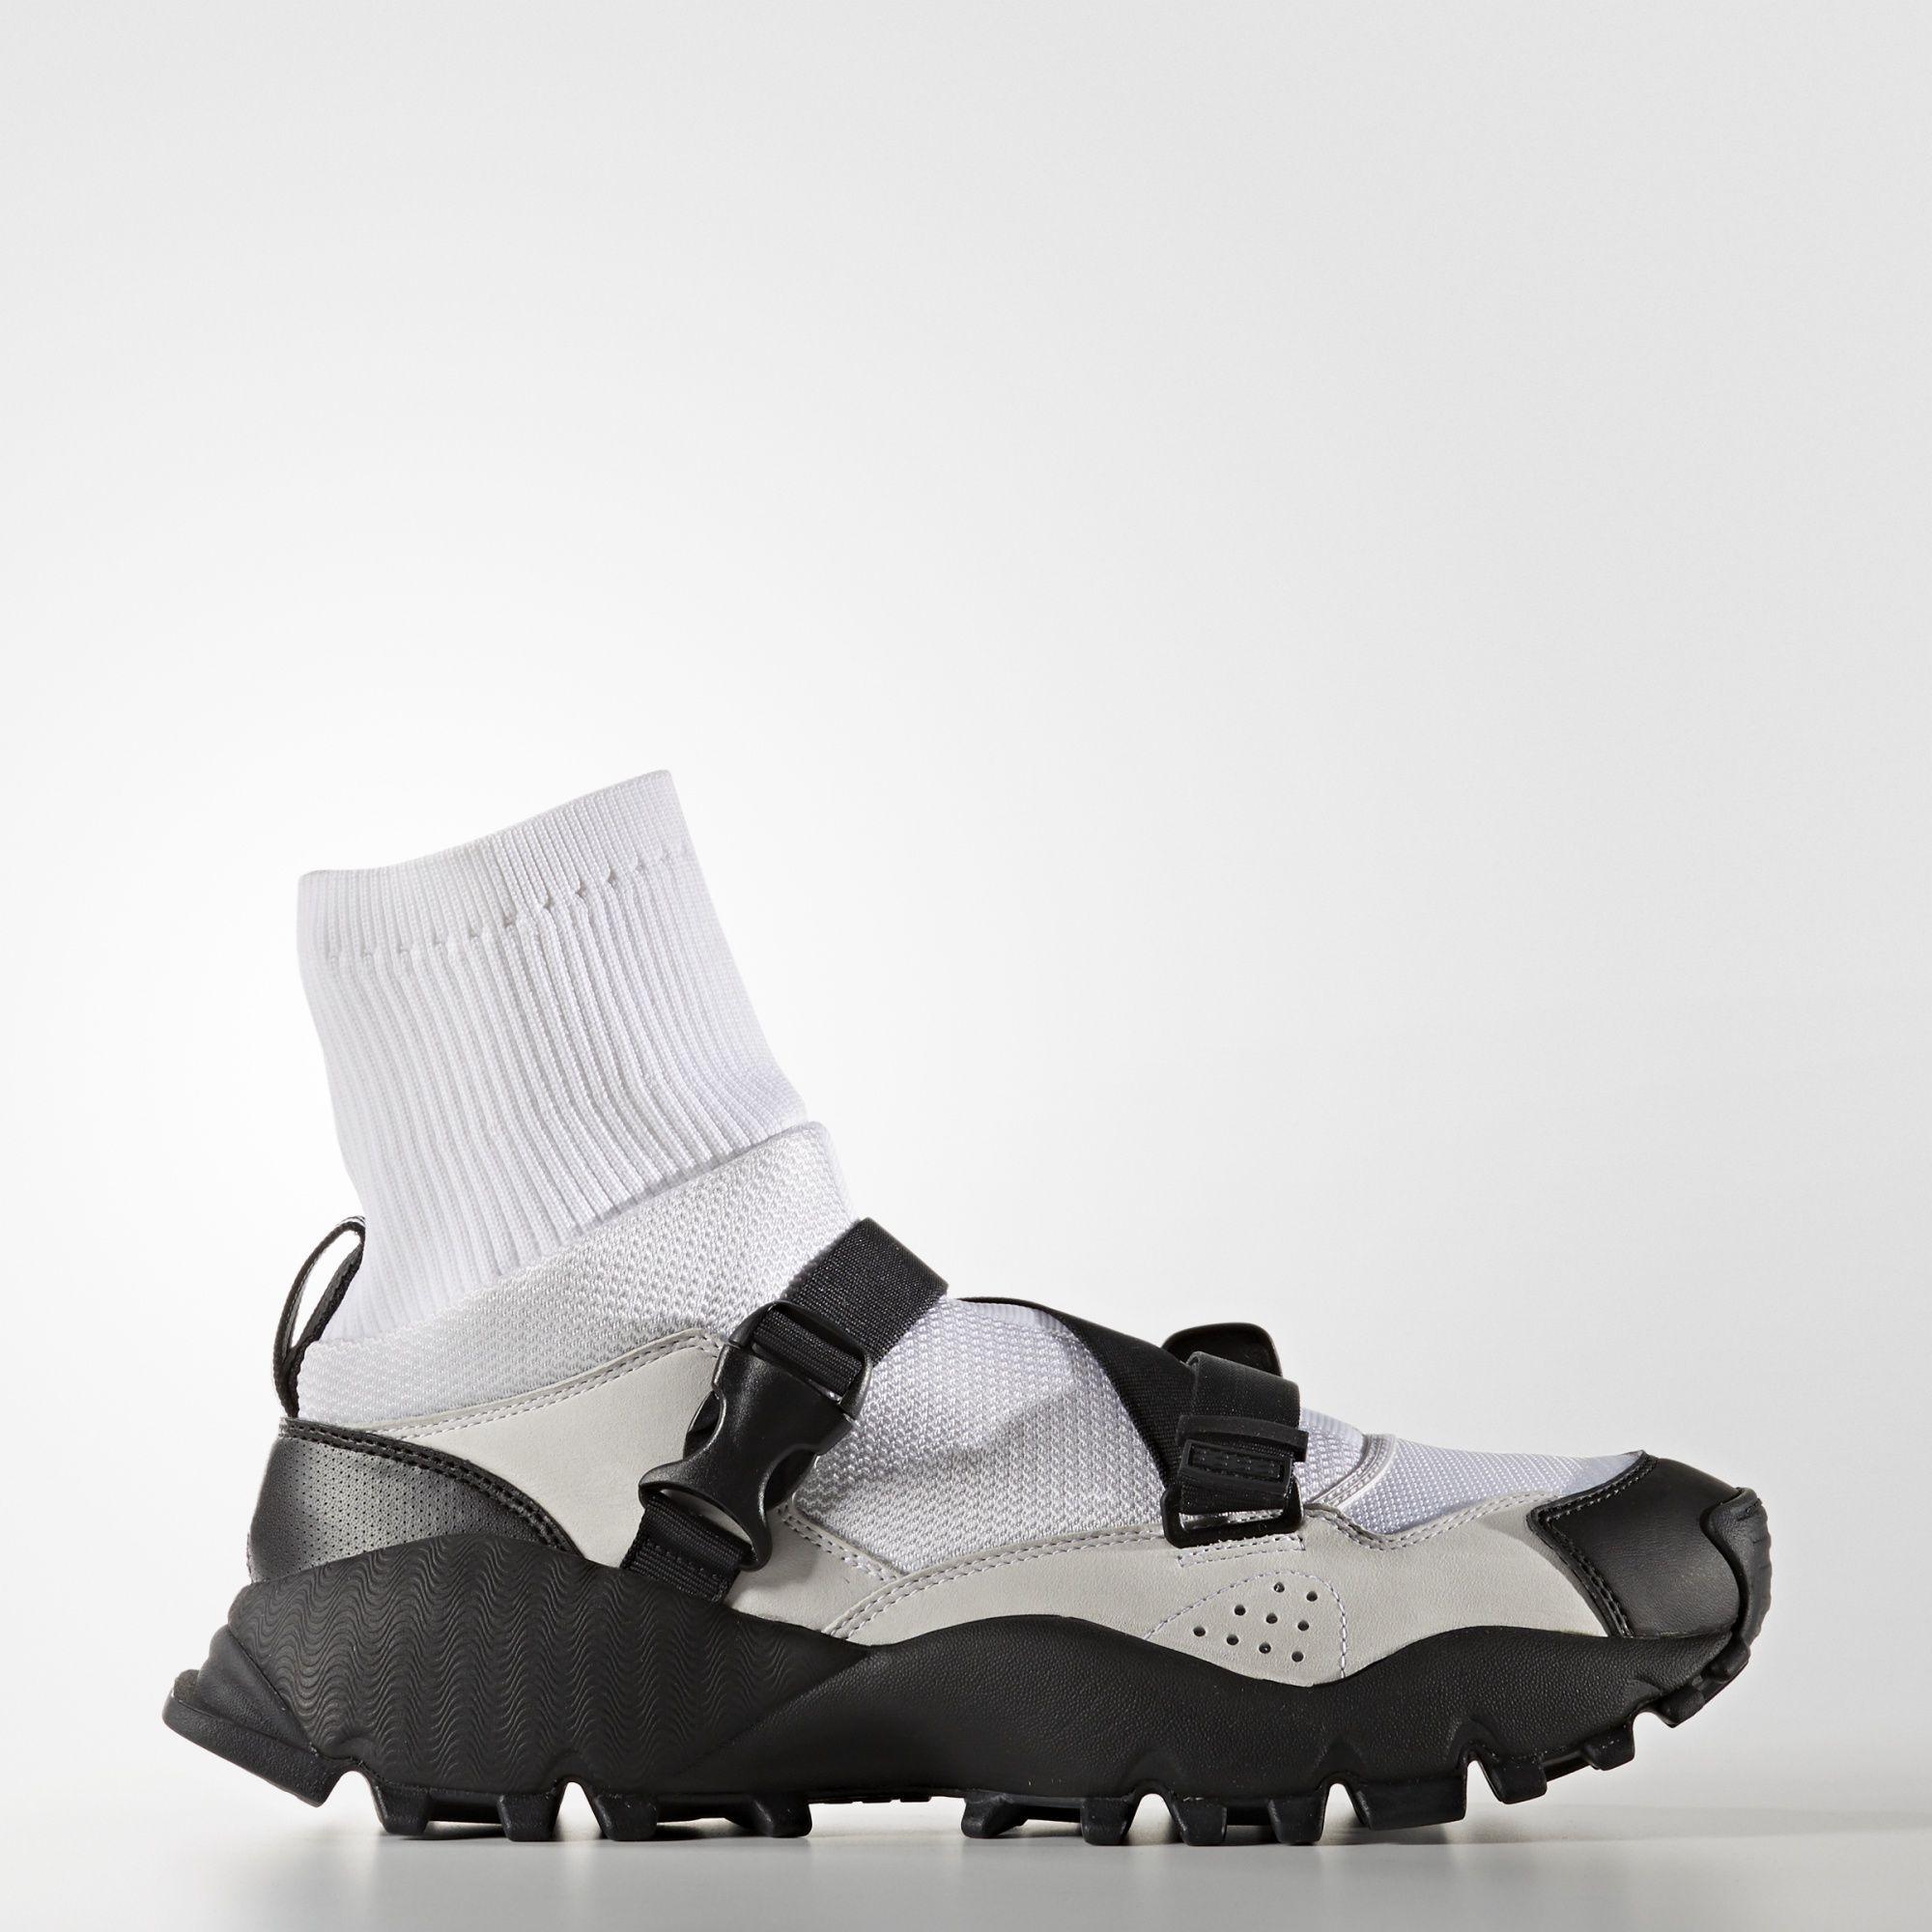 Adidas chaussure Aoh 010 Hi cosas Pinterest Adidas y padre